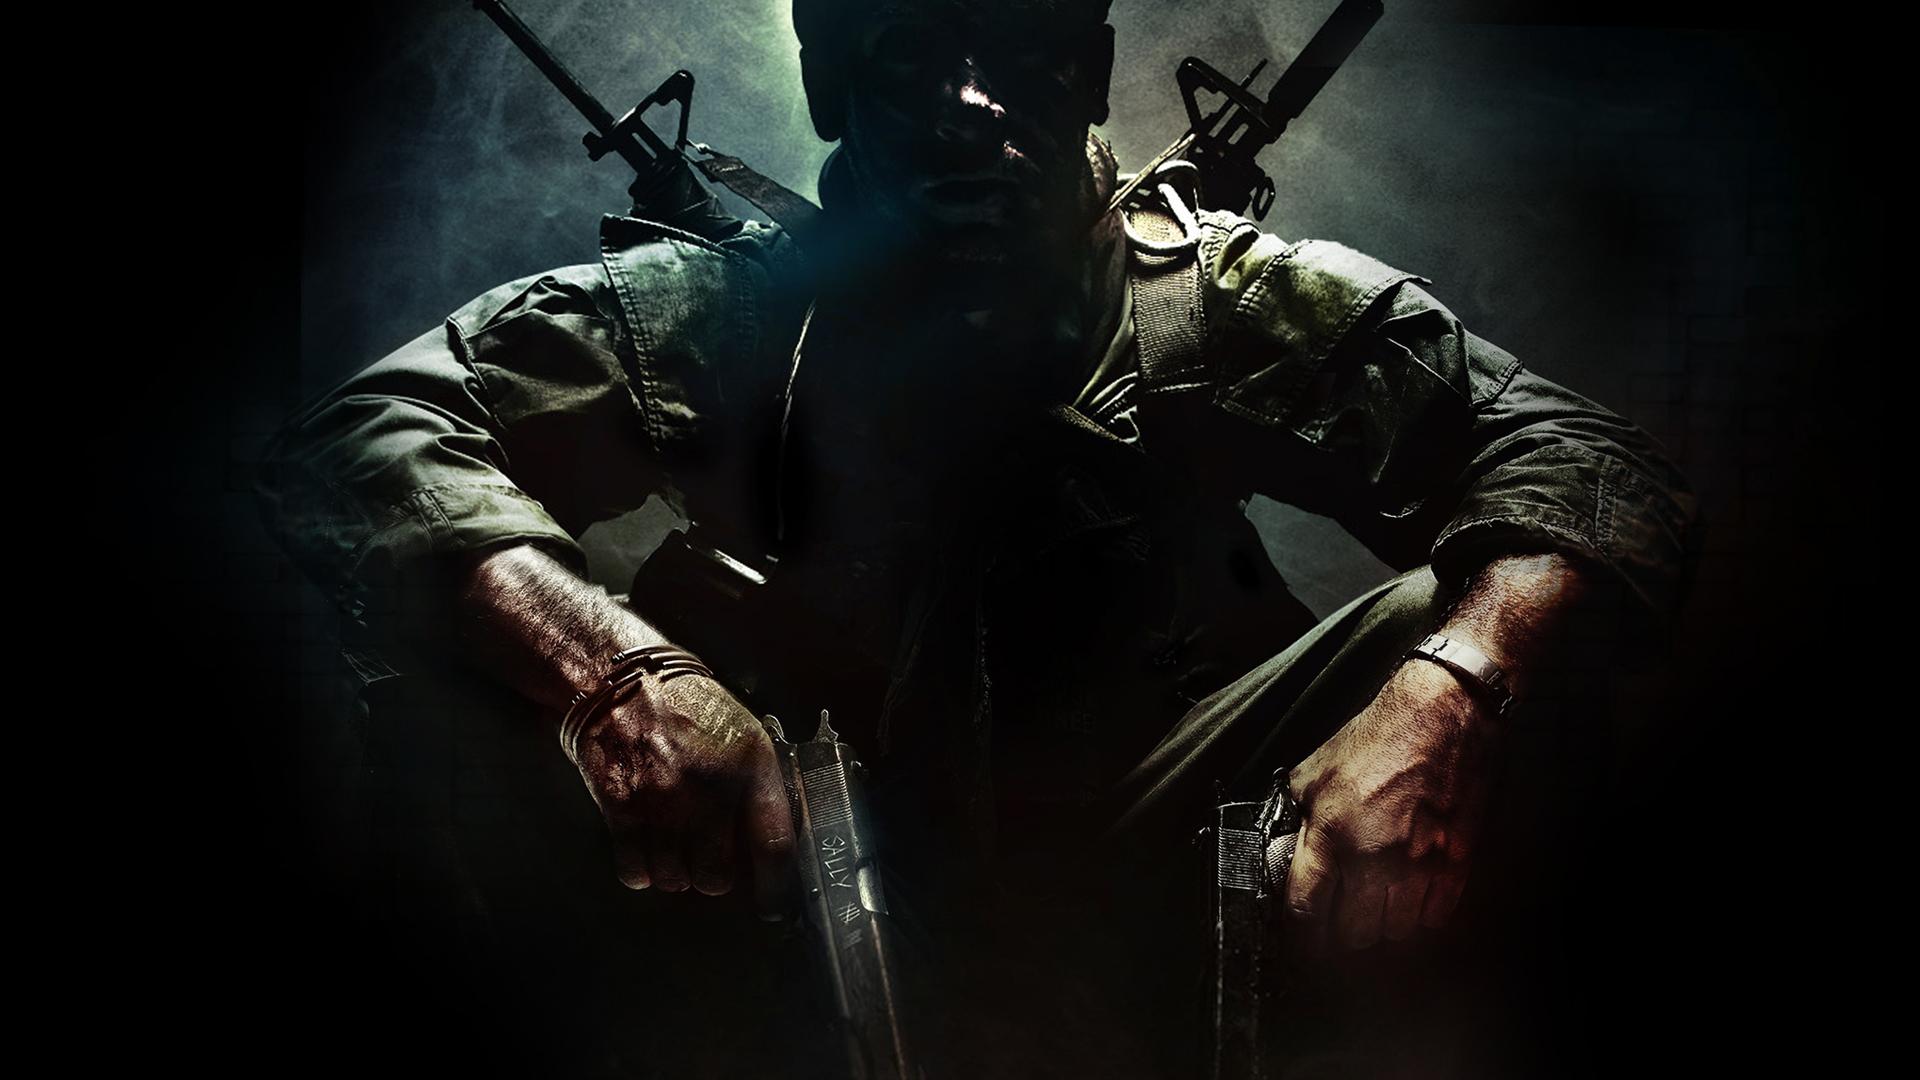 Call of Duty Black Ops Wallpaper   Videogames wallpaperCoolvibe 1920x1080